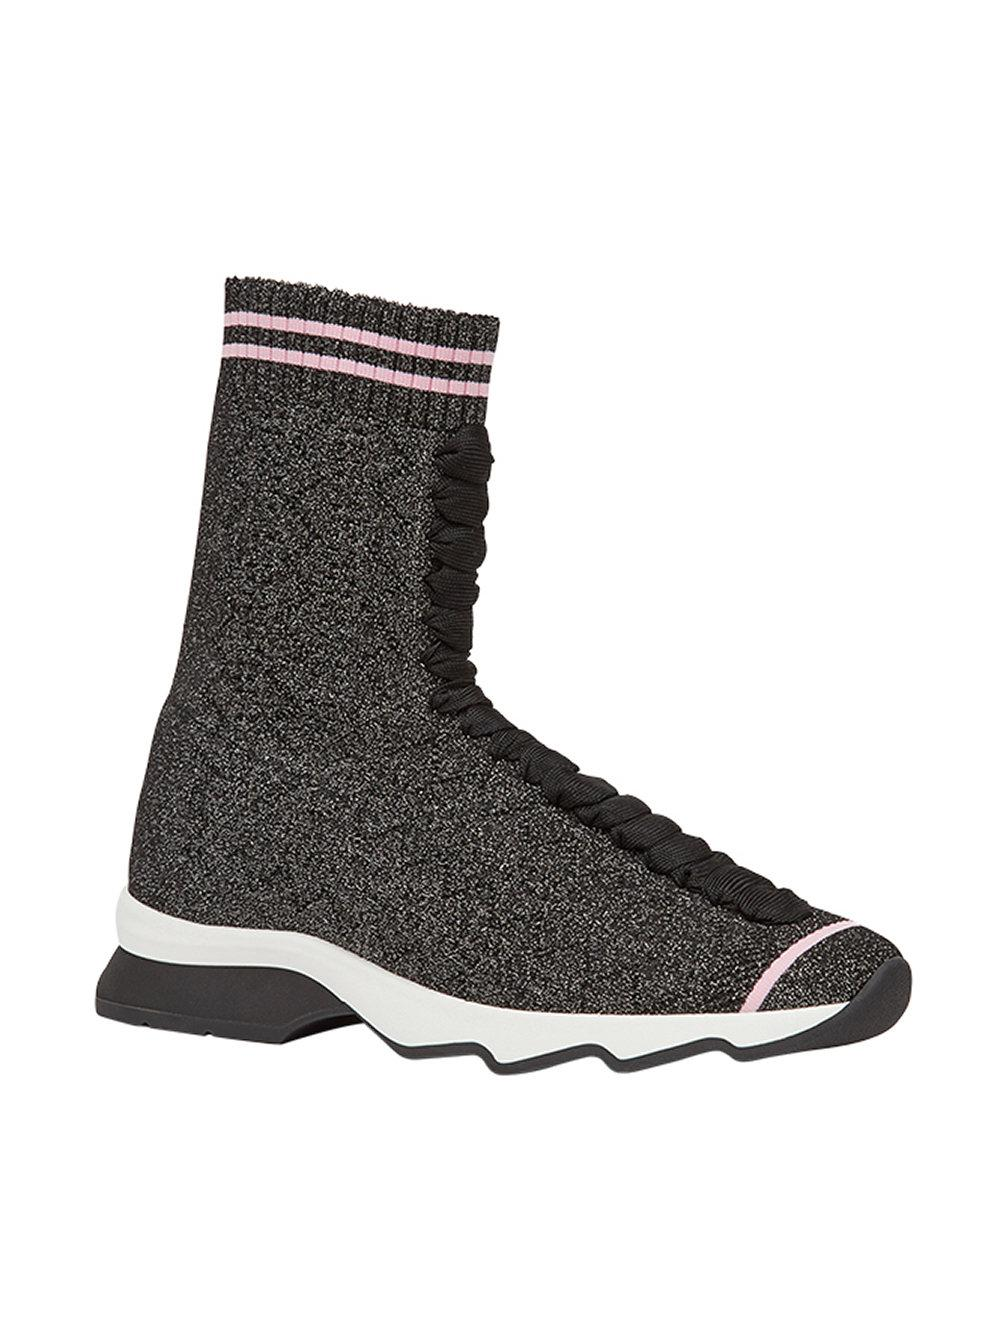 Fendi Sneakers In Tessuto in Black - Save 51% - Lyst 2418977f67e